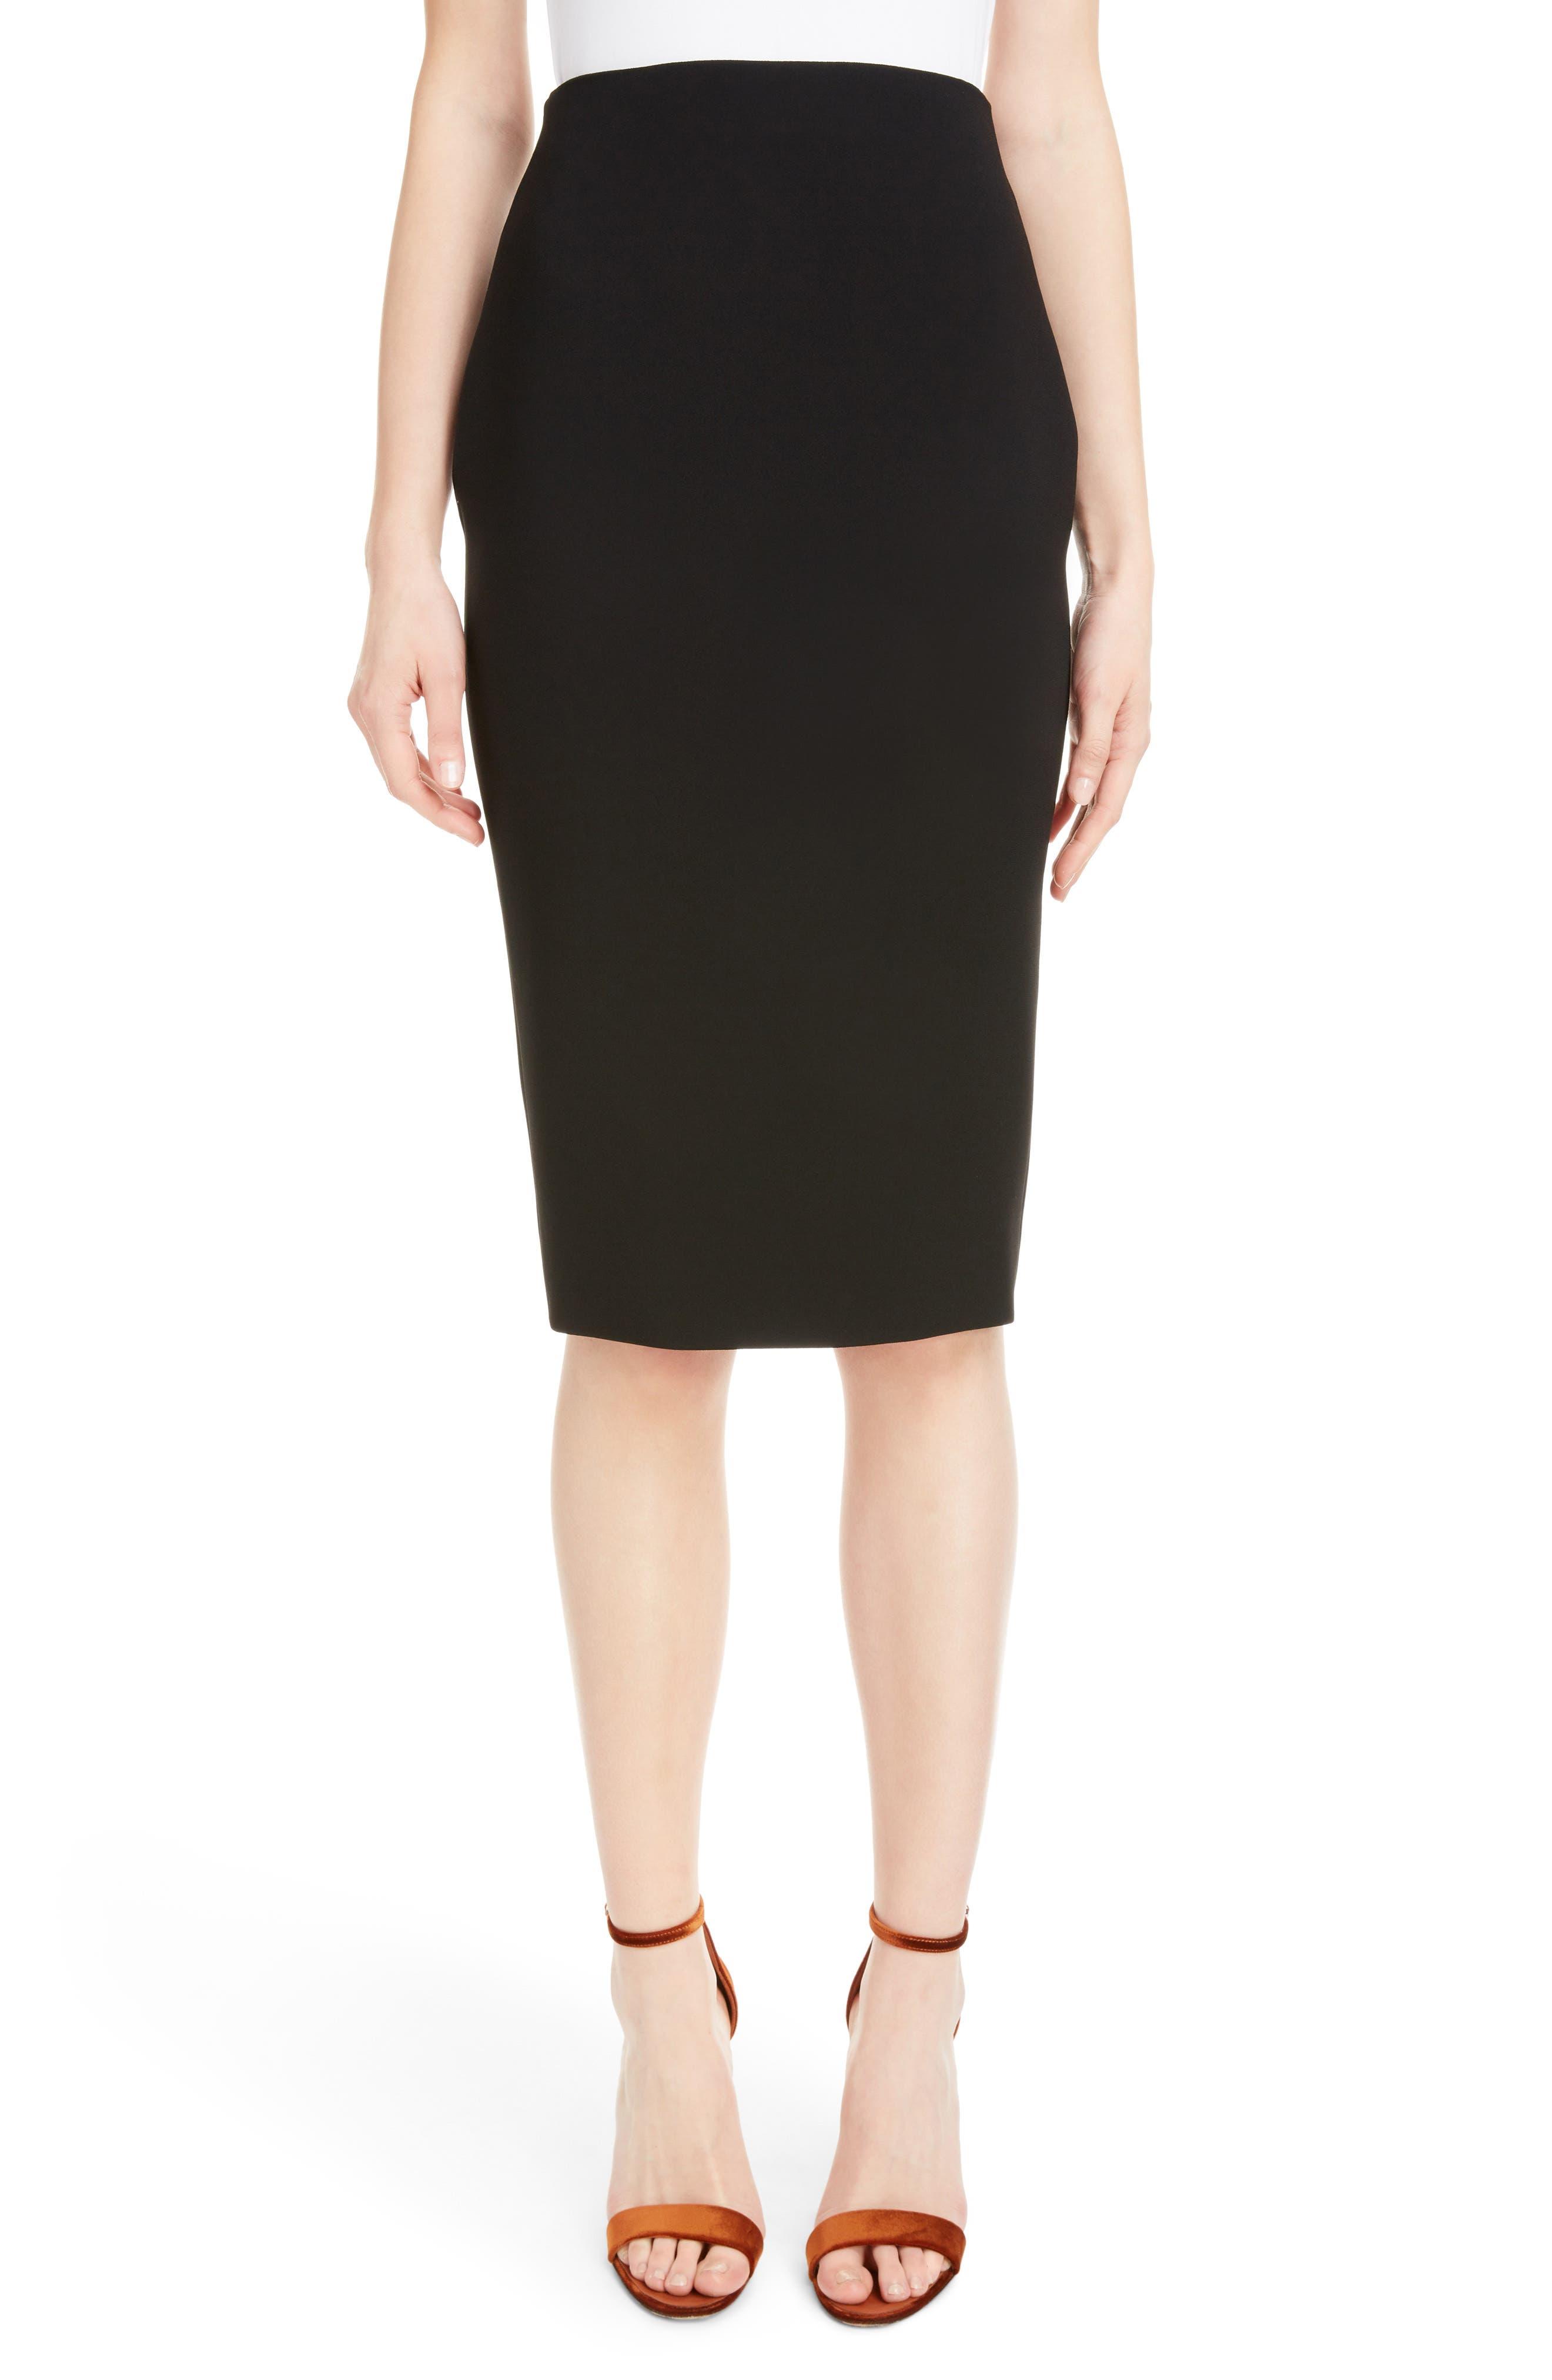 VICTORIA BECKHAM Back Zip Pencil Skirt, Main, color, BLACK